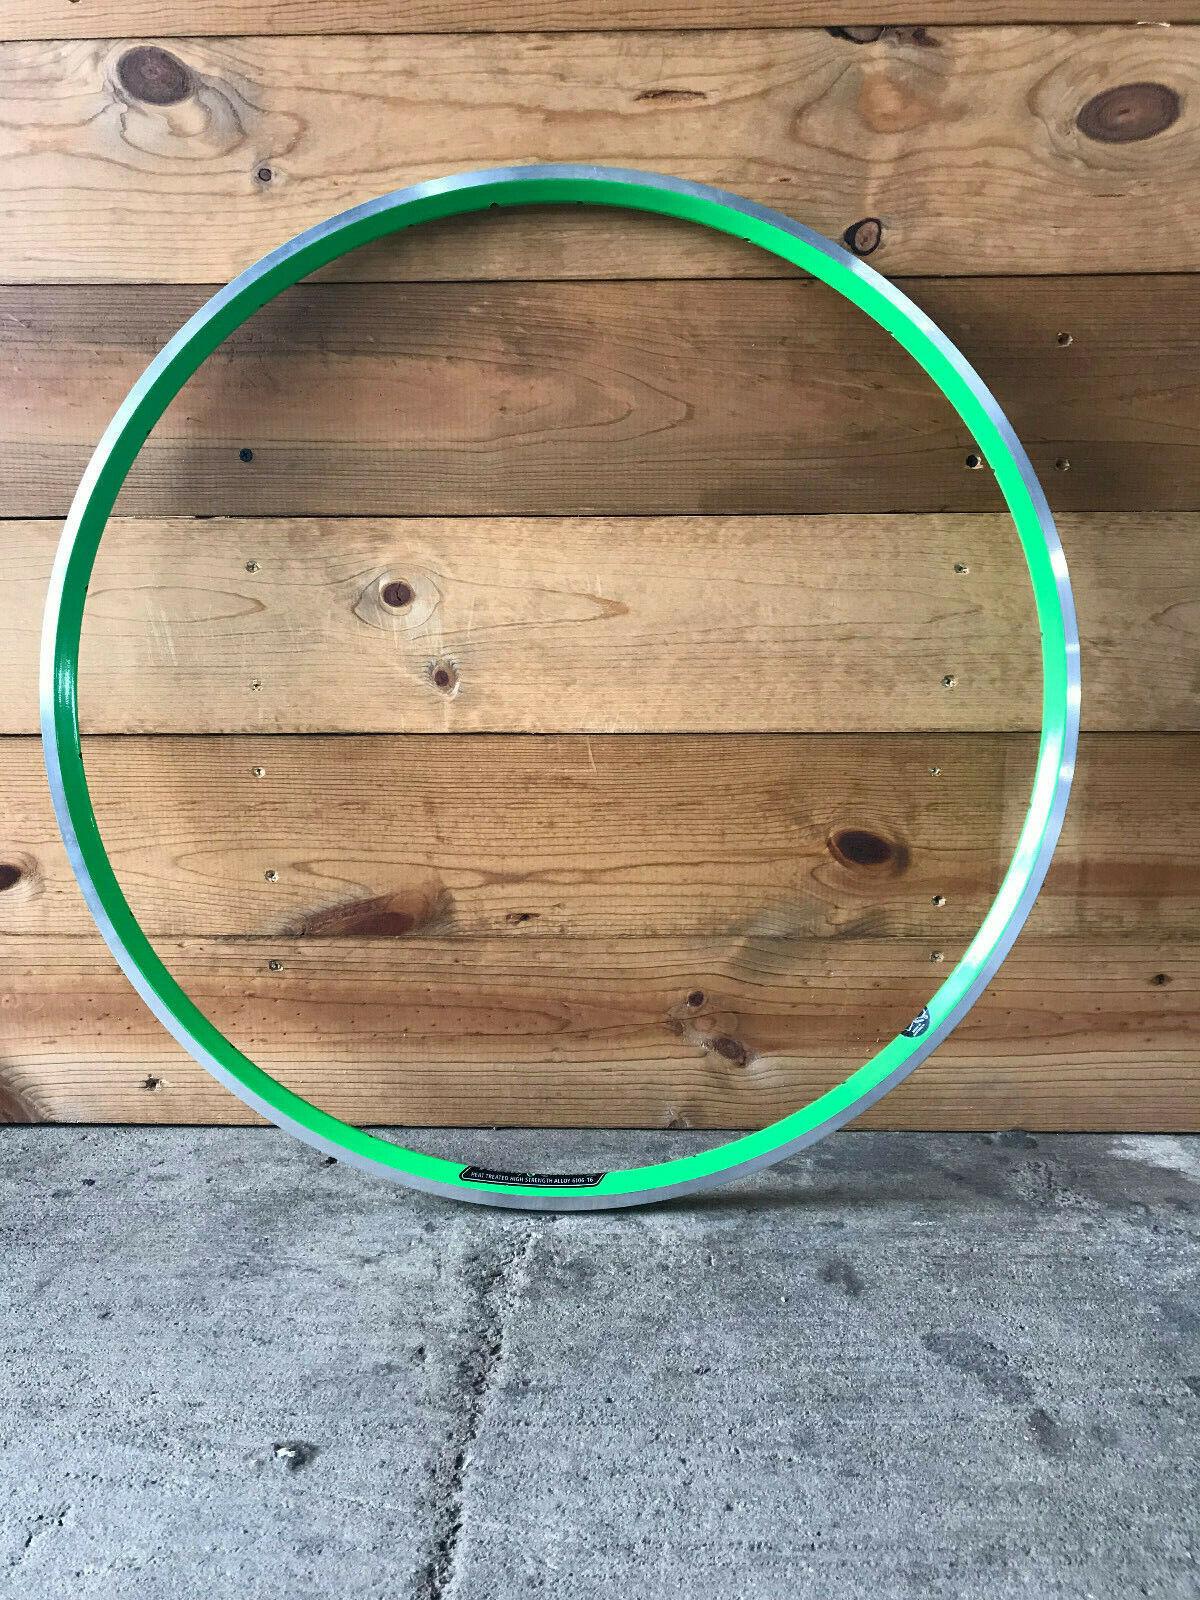 Velocity Aerohead Rim 700c 18  Hole Ma ned Sidewall, Green  online fashion shopping